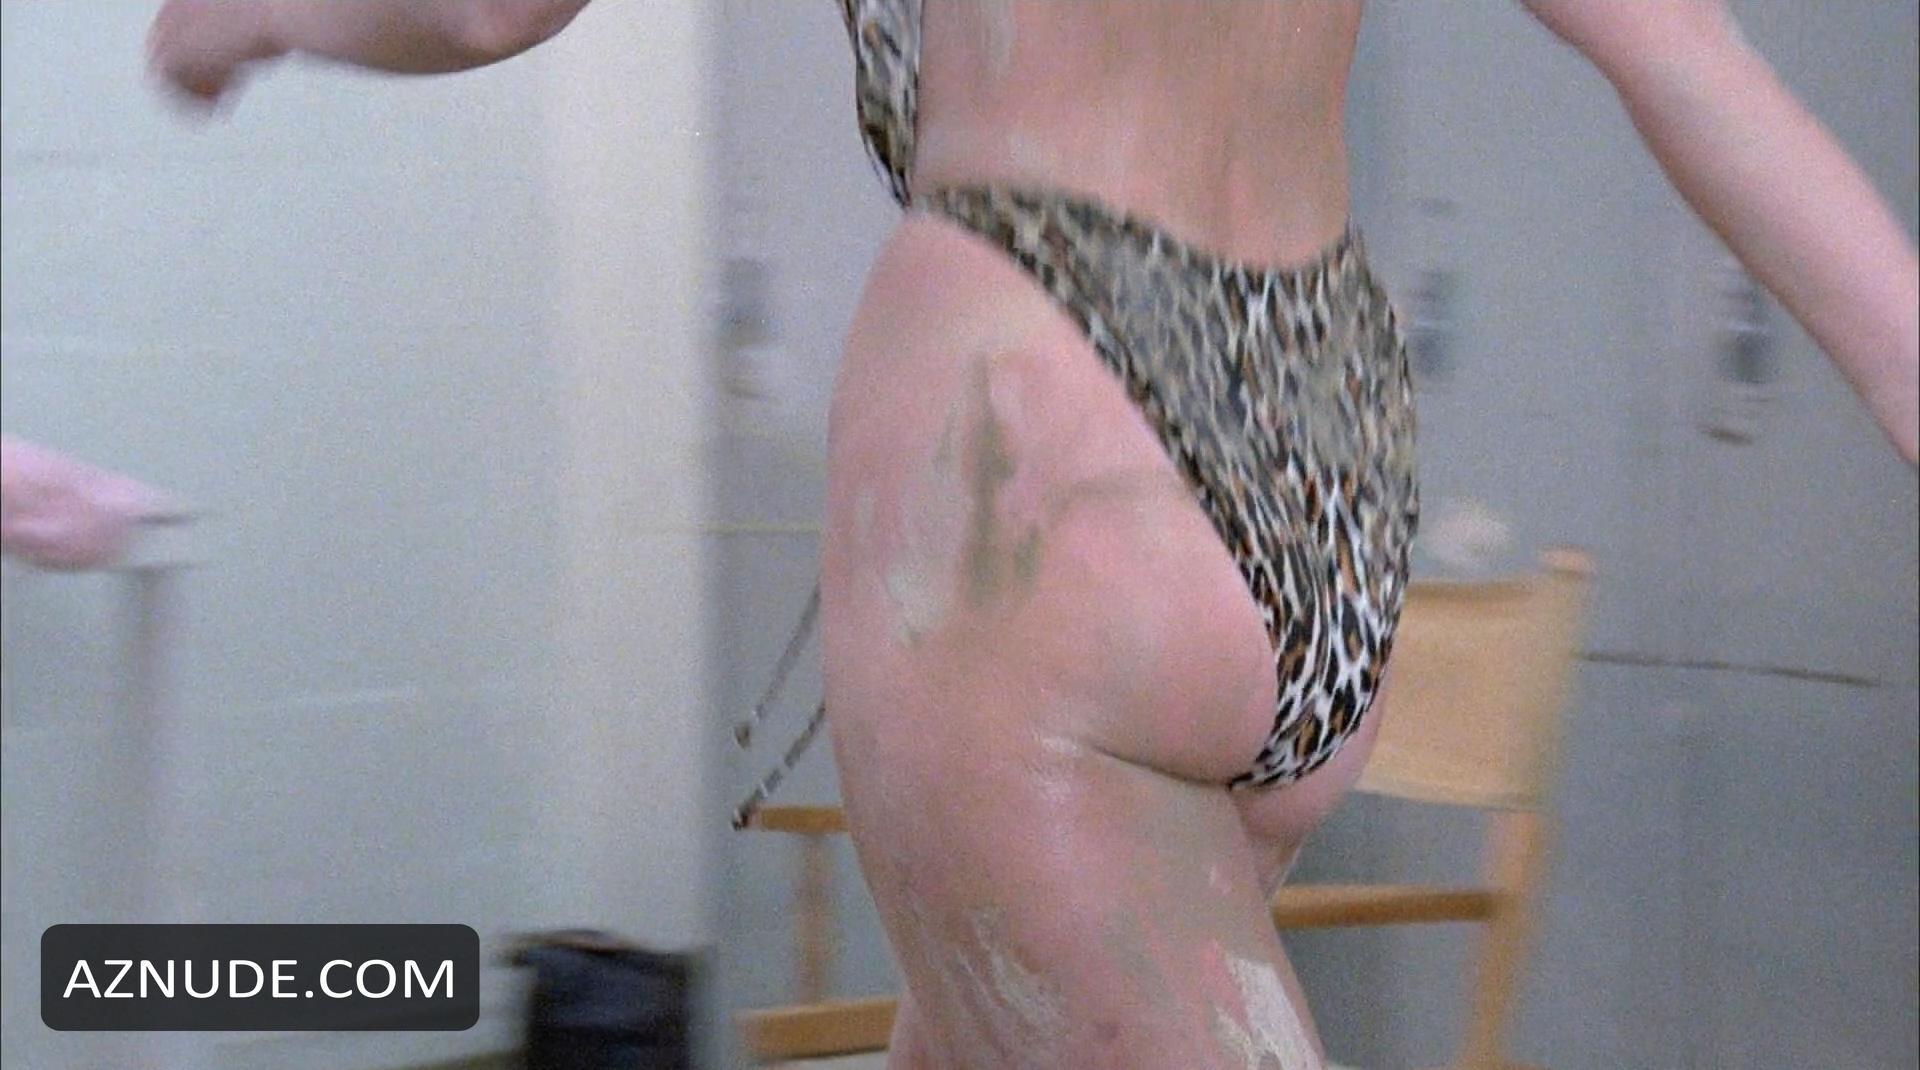 kardashian sex tape online